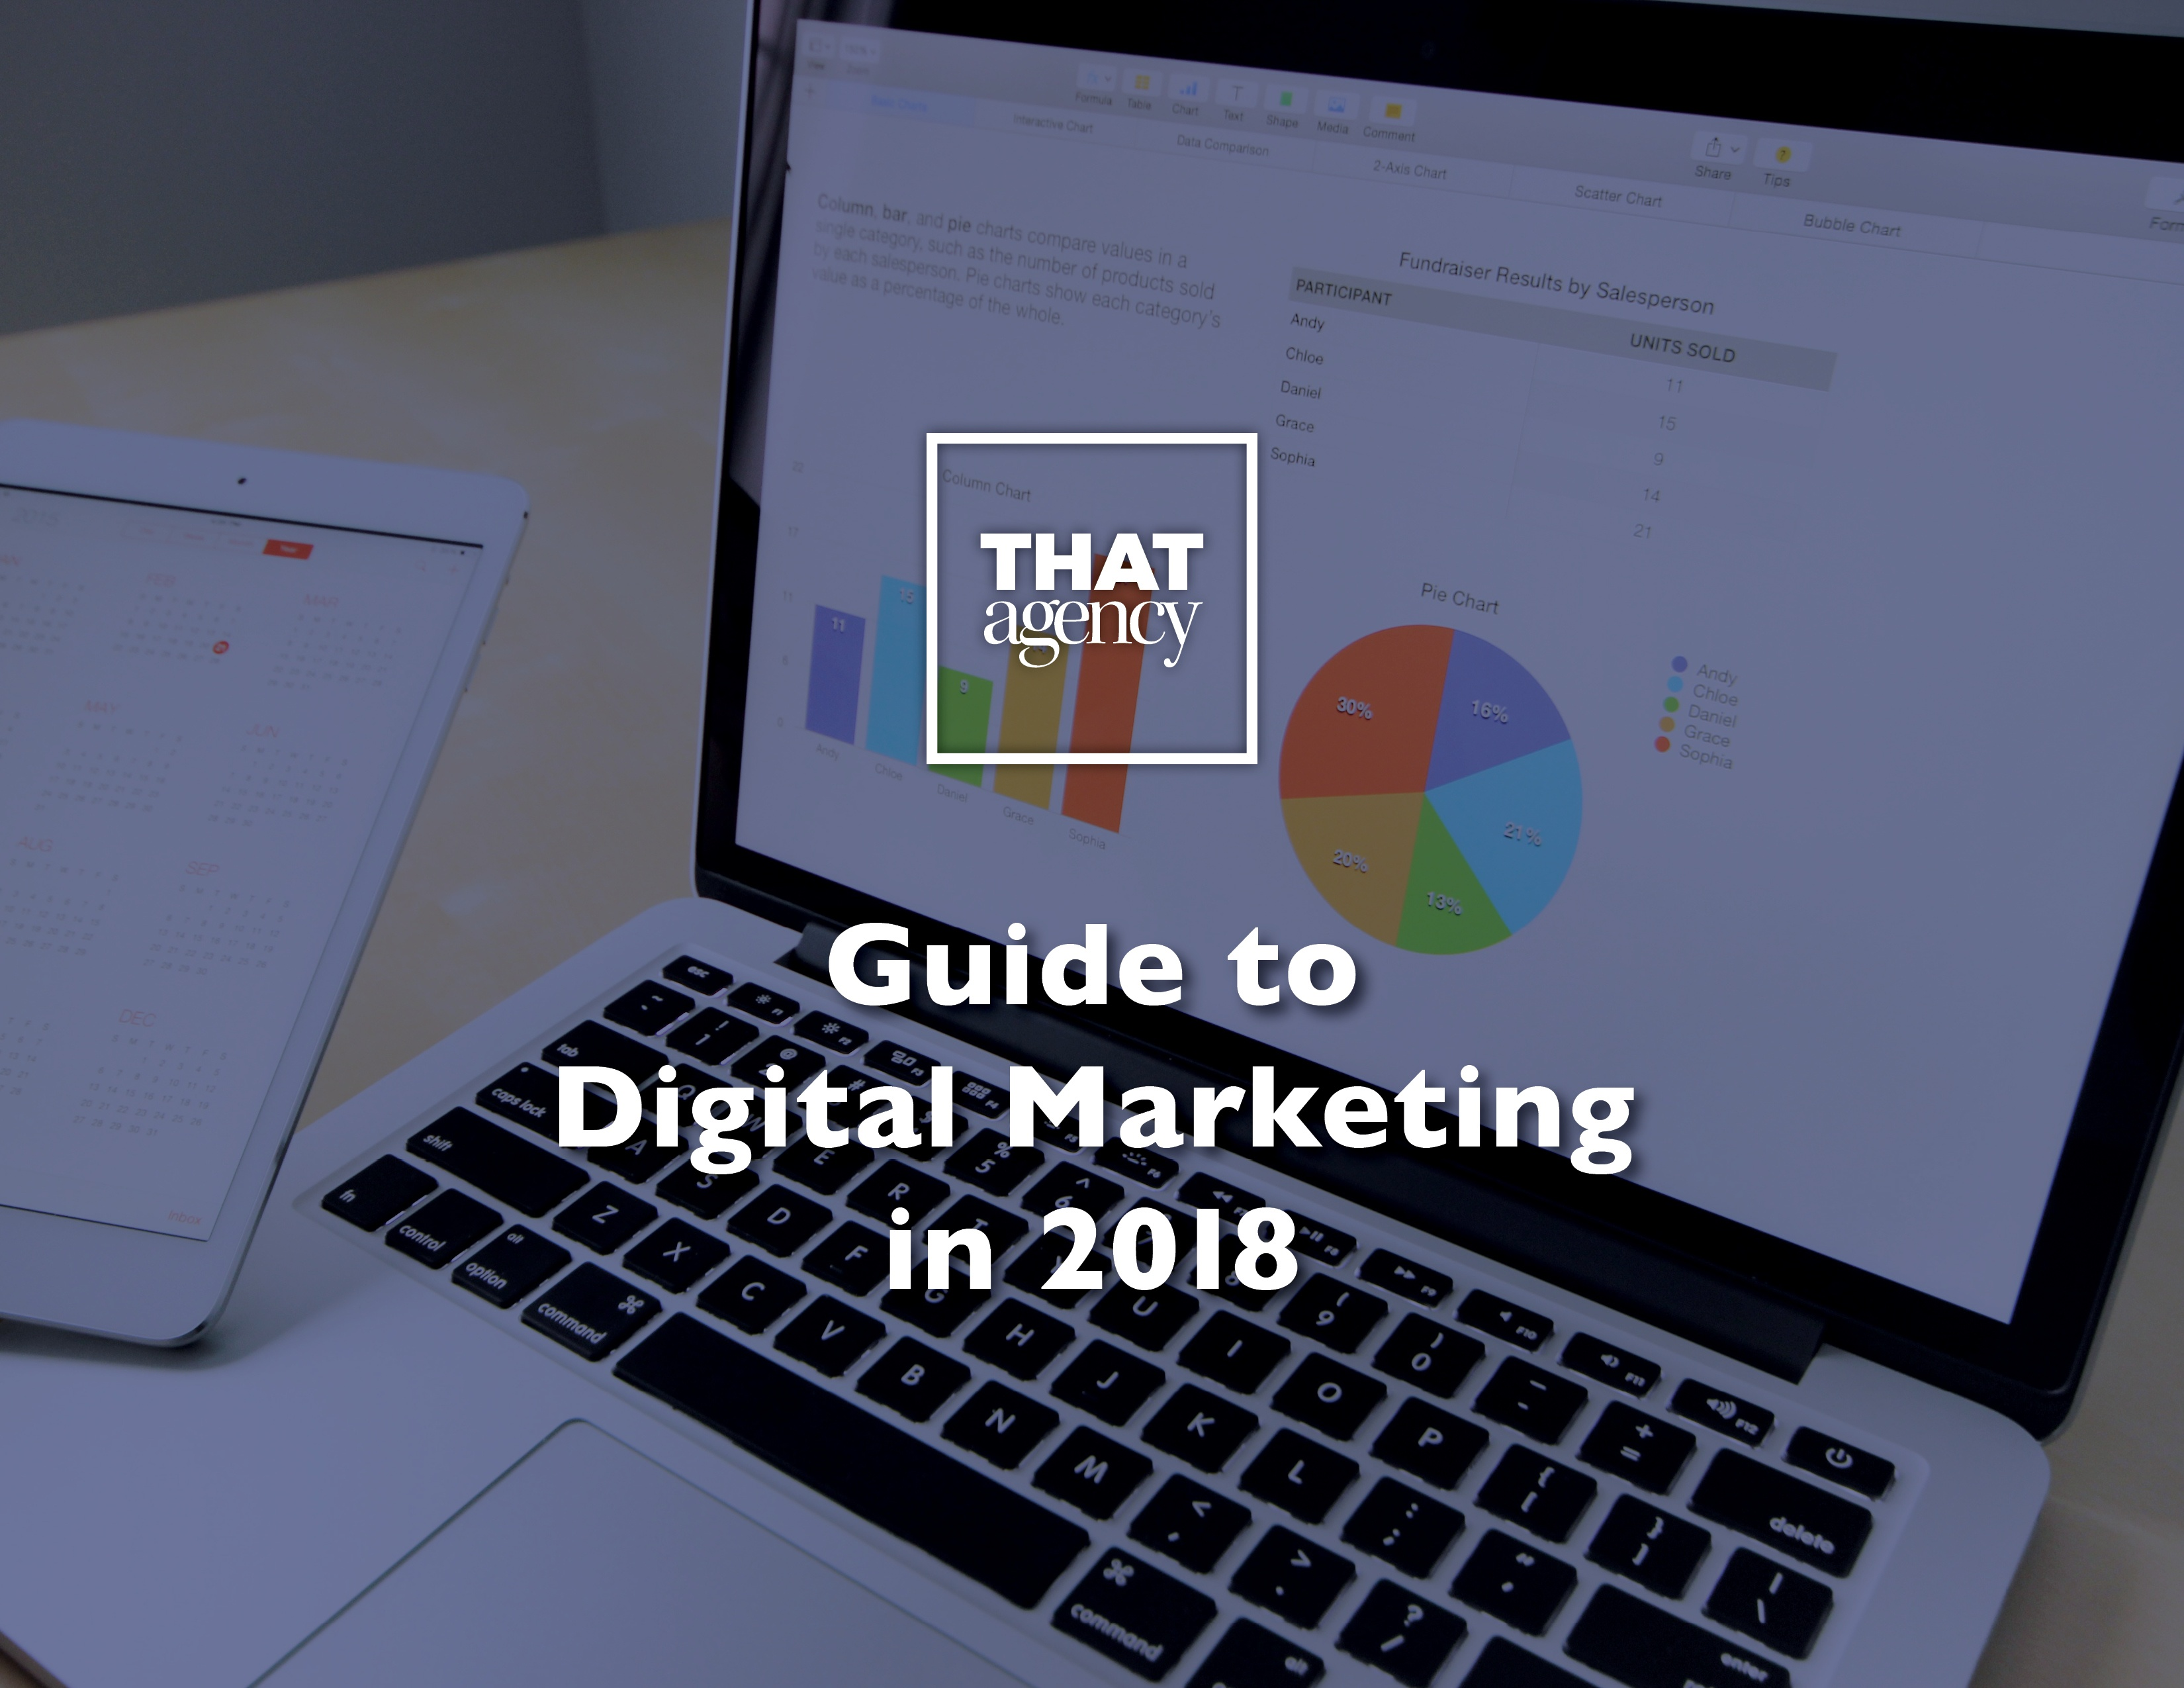 2018 Digital Marketing Guide | THAT Agency